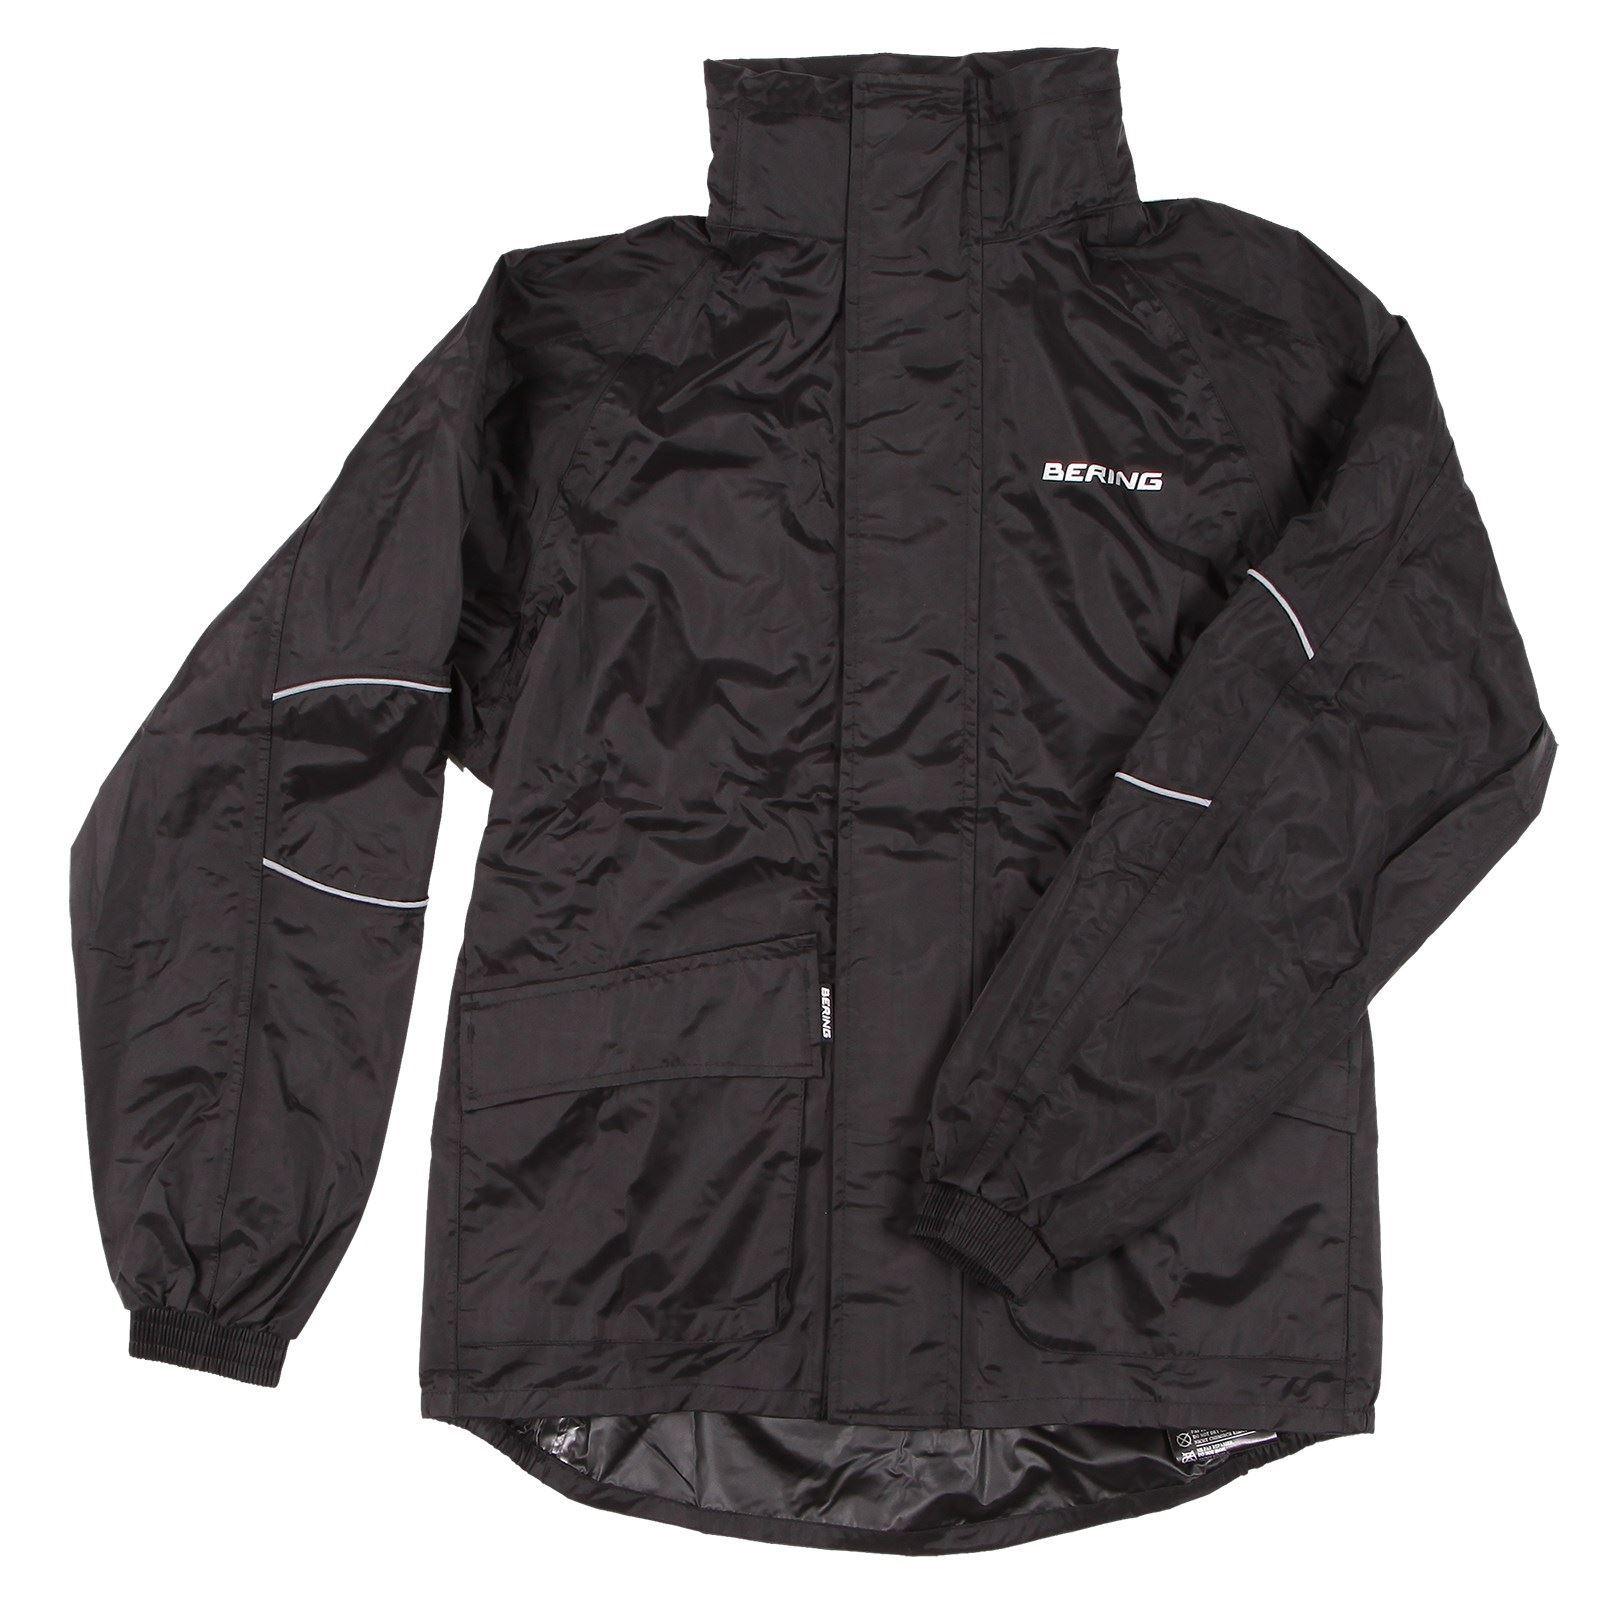 Bering Αδιάβροχο Τζάκετ Maniwata